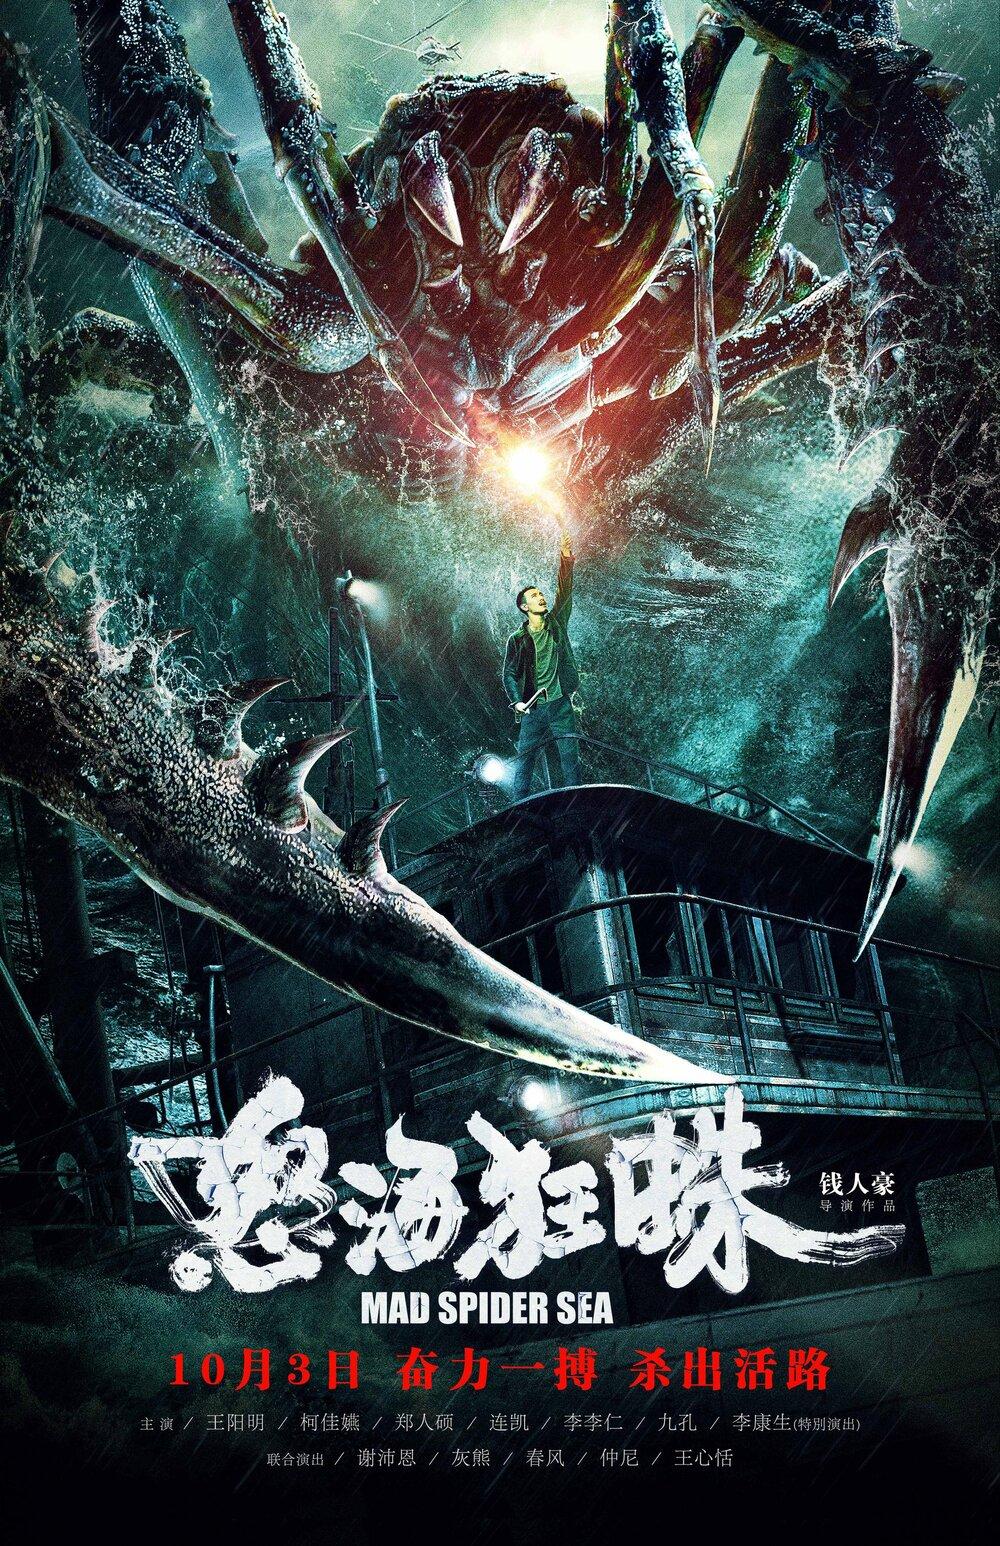 Abyssal Spider Horror Plakat